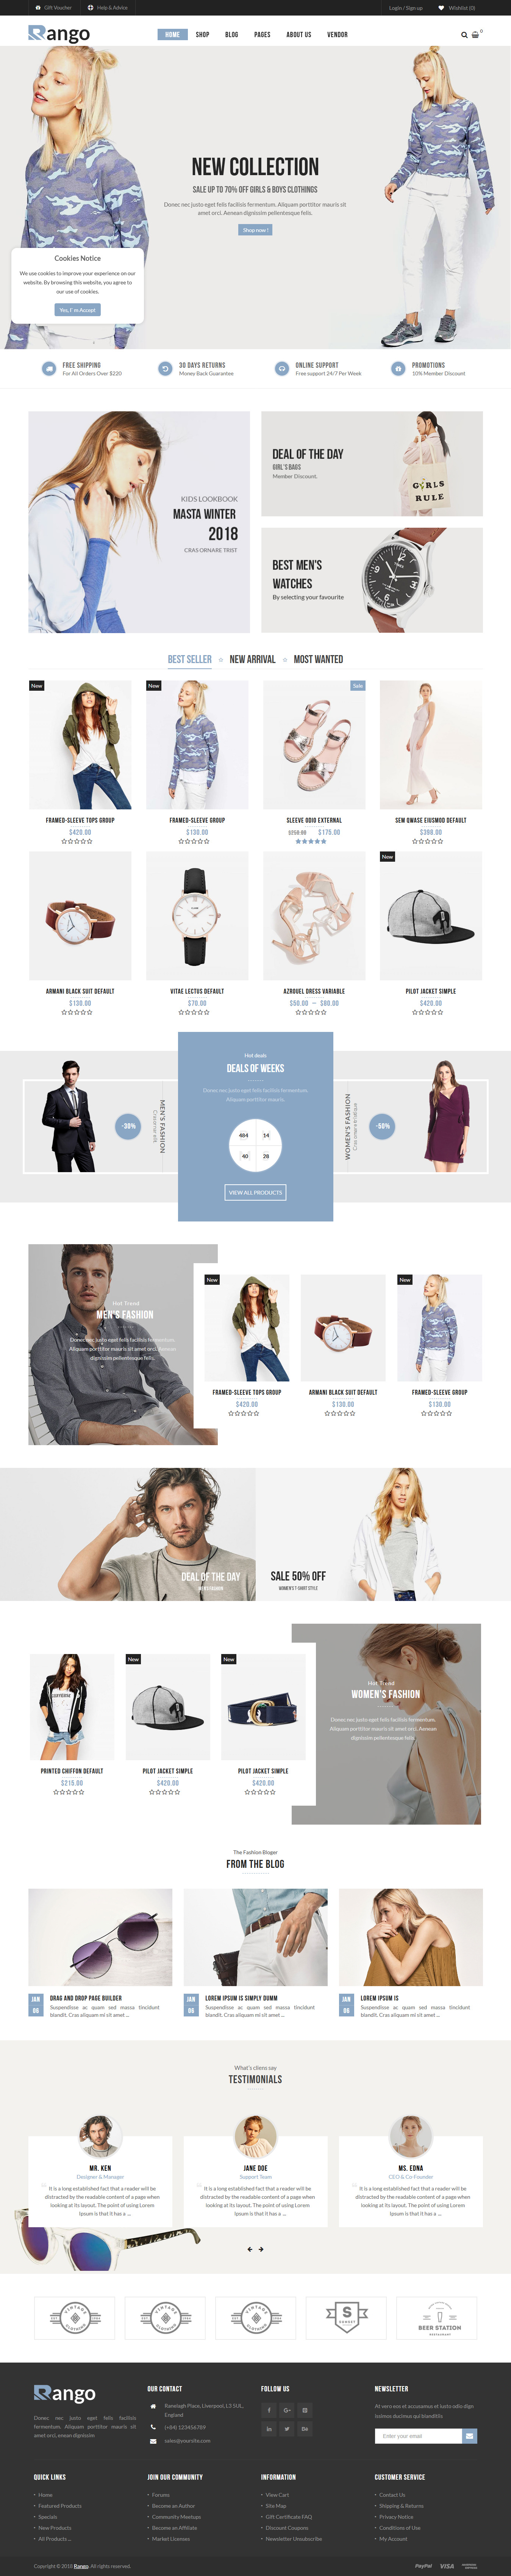 Rango - Best Premium Fashion WordPress Themes